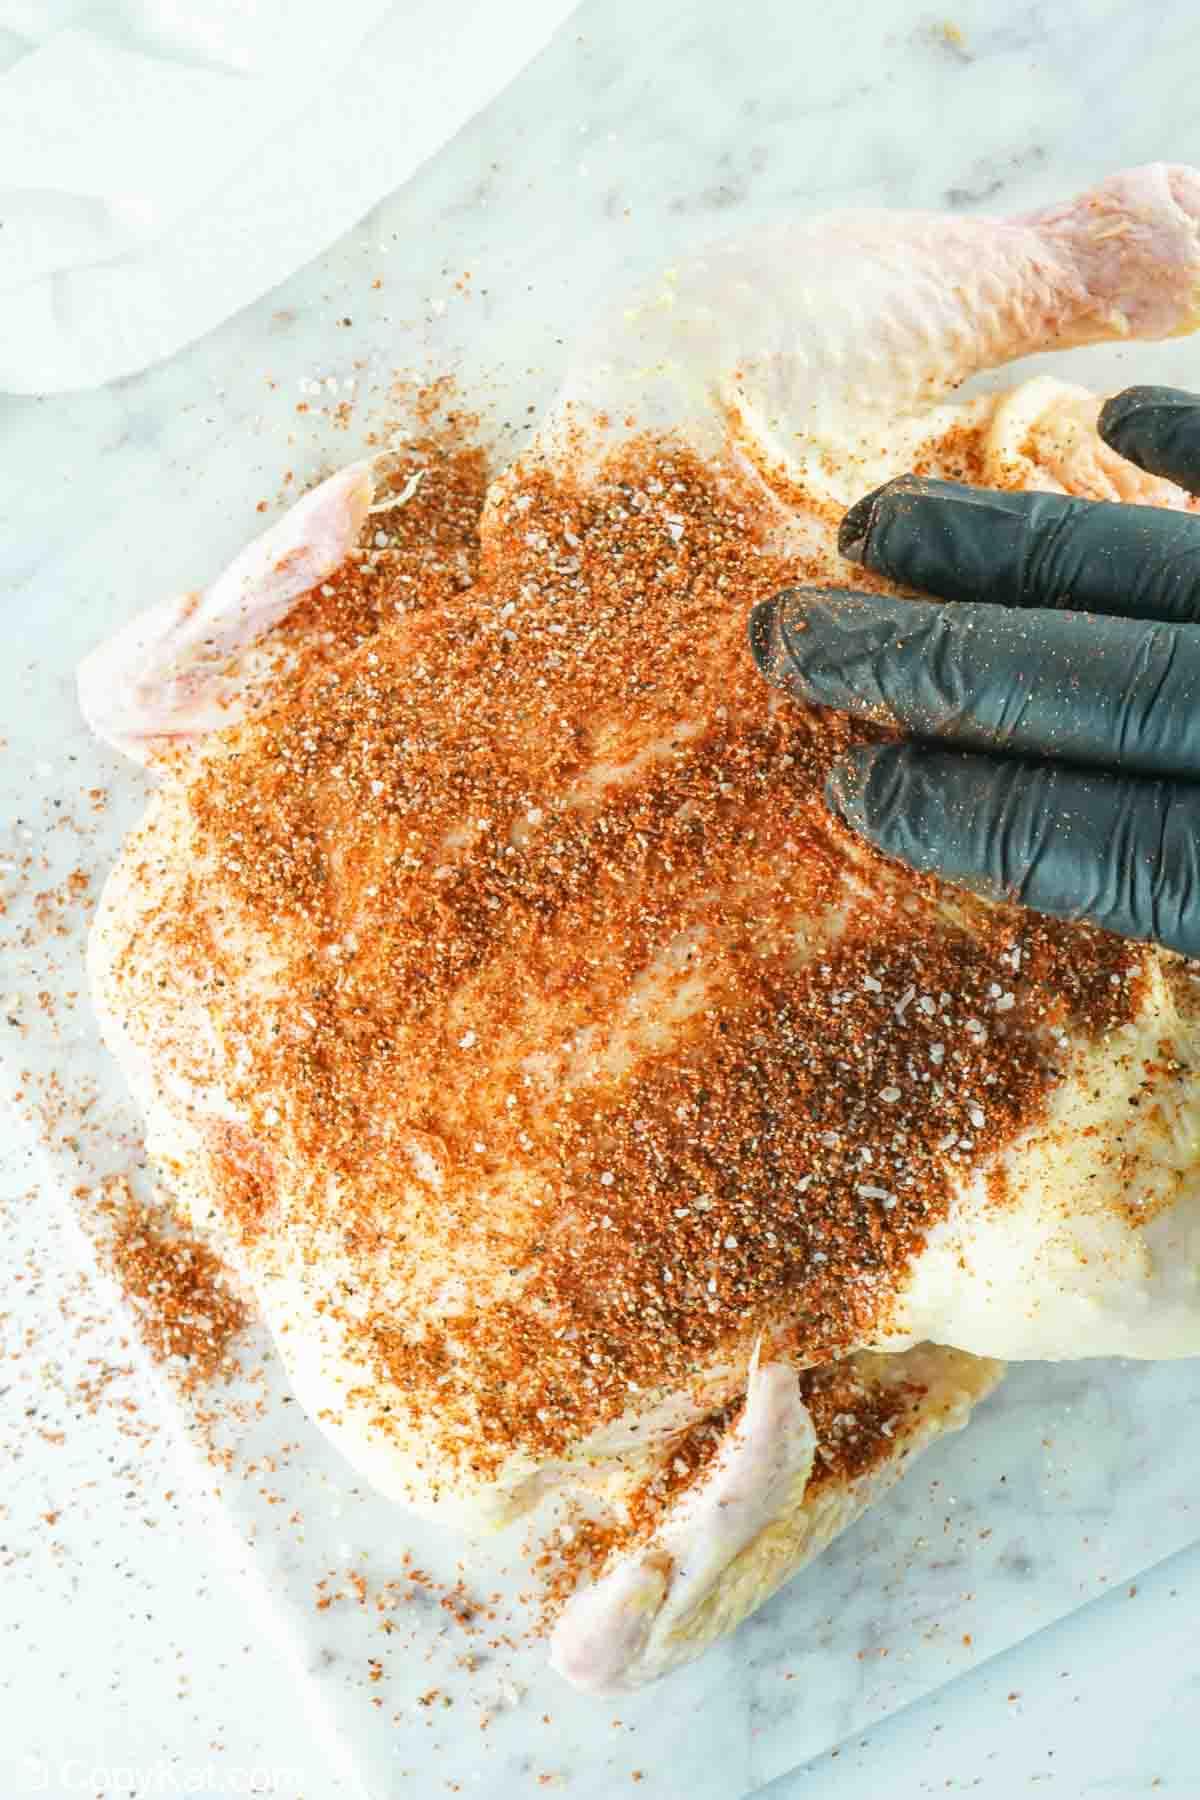 rubbing seasoning on a whole chicken